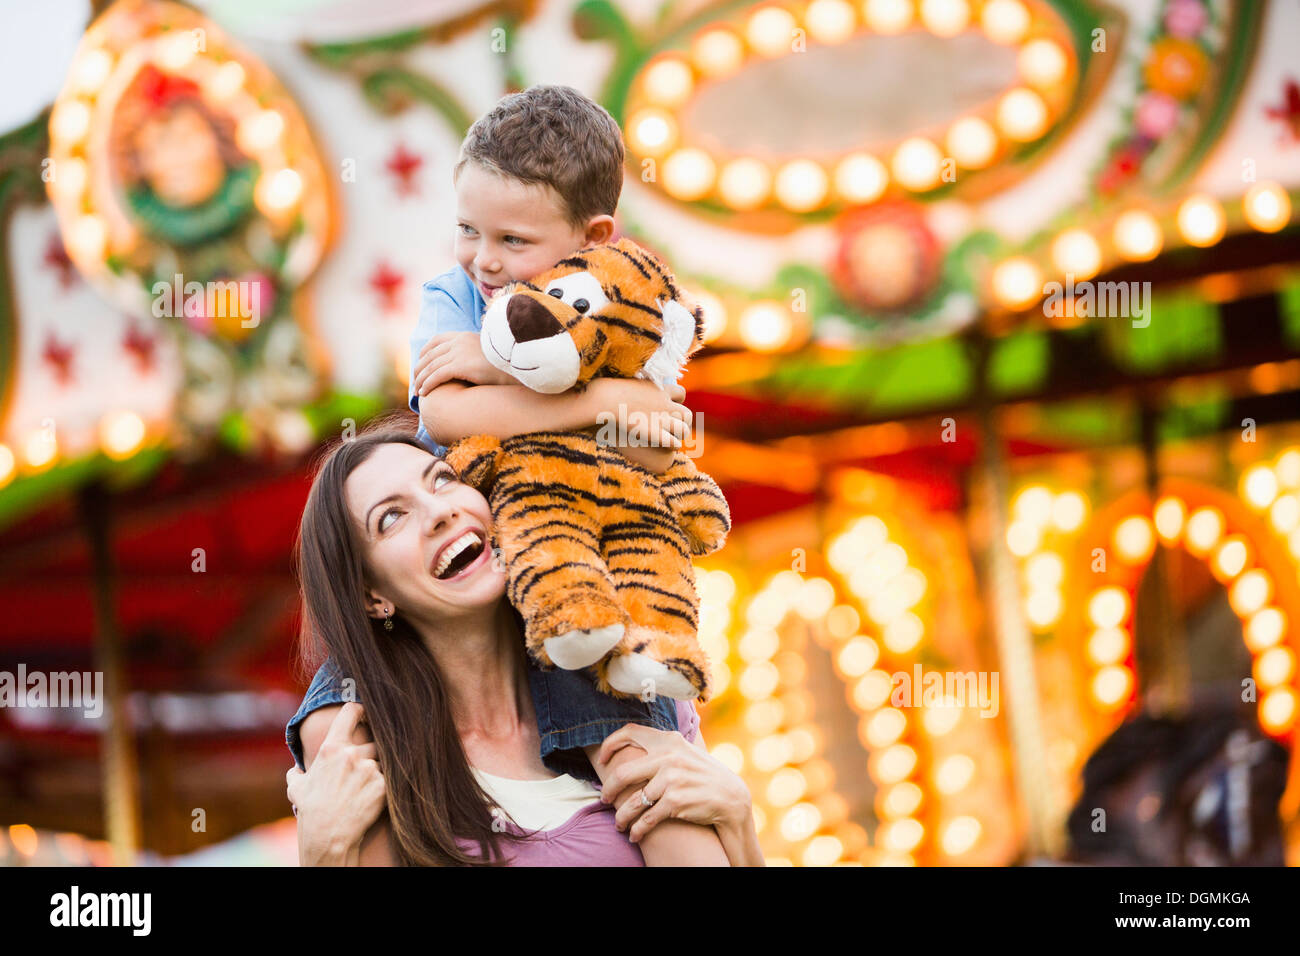 USA, Utah, Salt Lake City, Mother giving her son (4-5) piggyback ride in amusement park - Stock Image